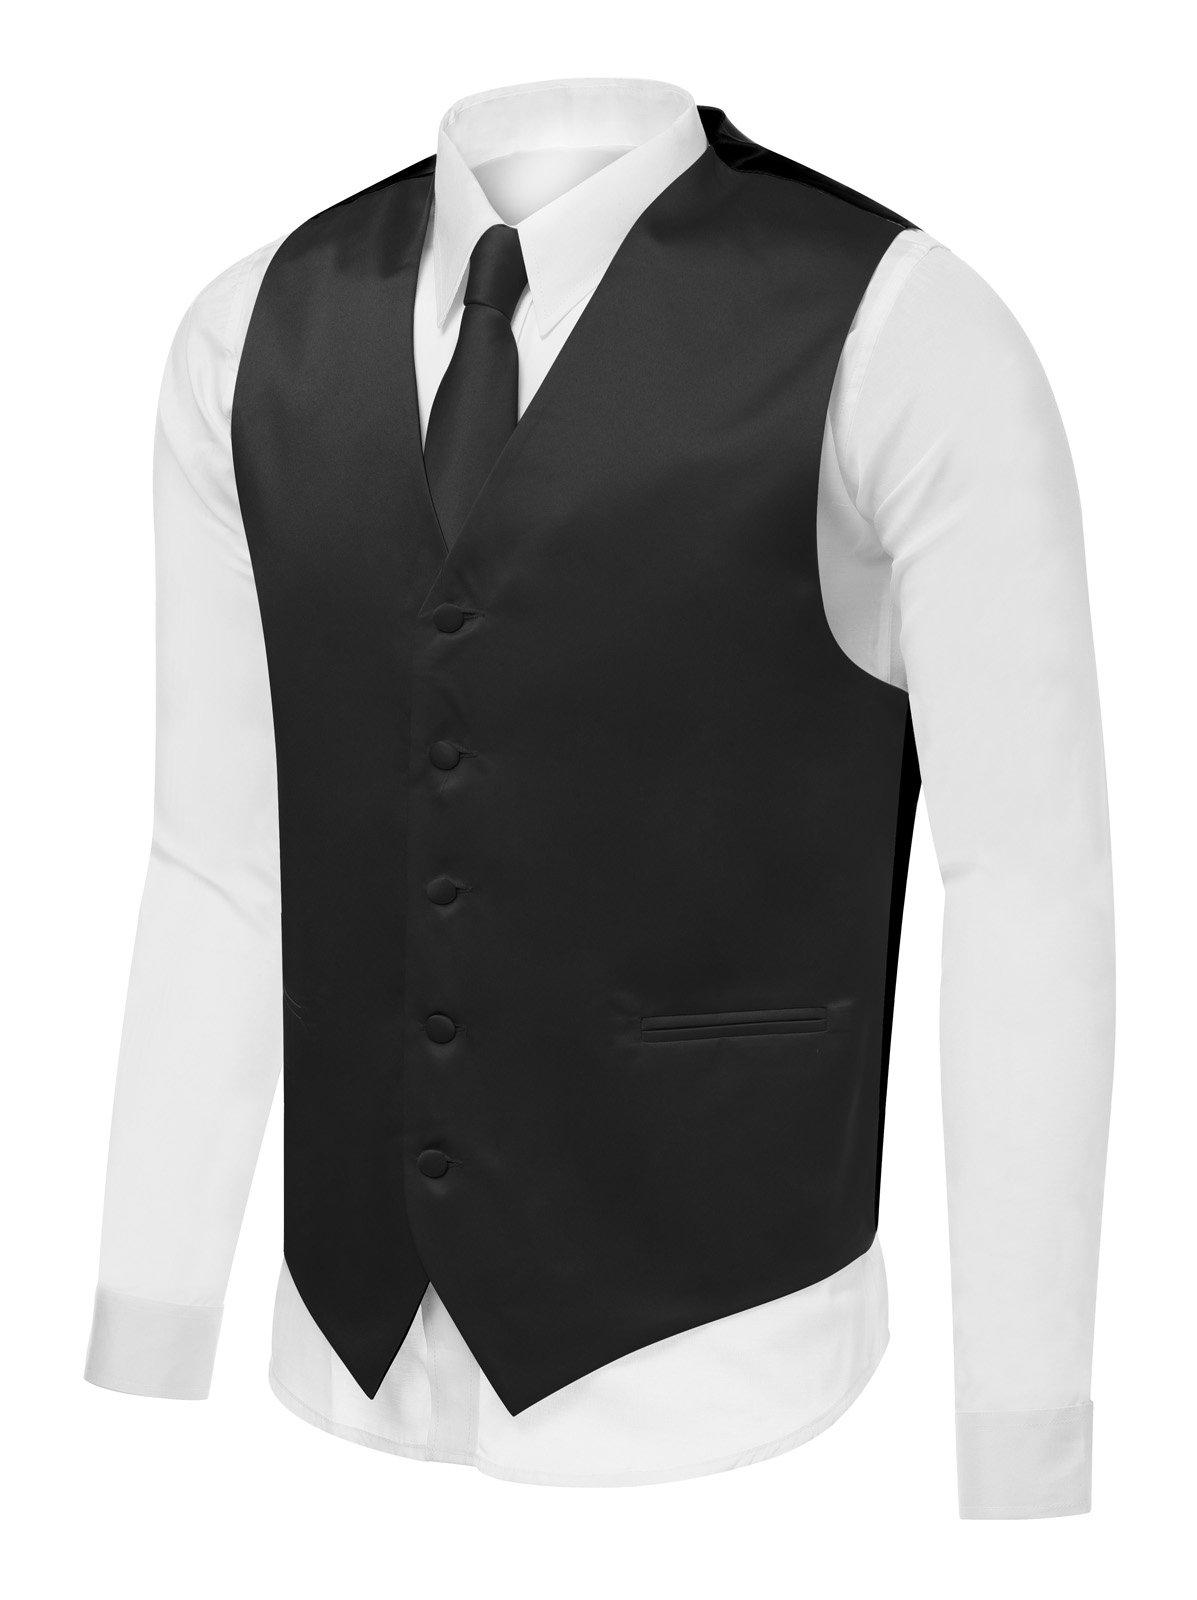 Azzurro Men's Dress Vest Set Neck Tie, Hanky for Suit or Tuxedo